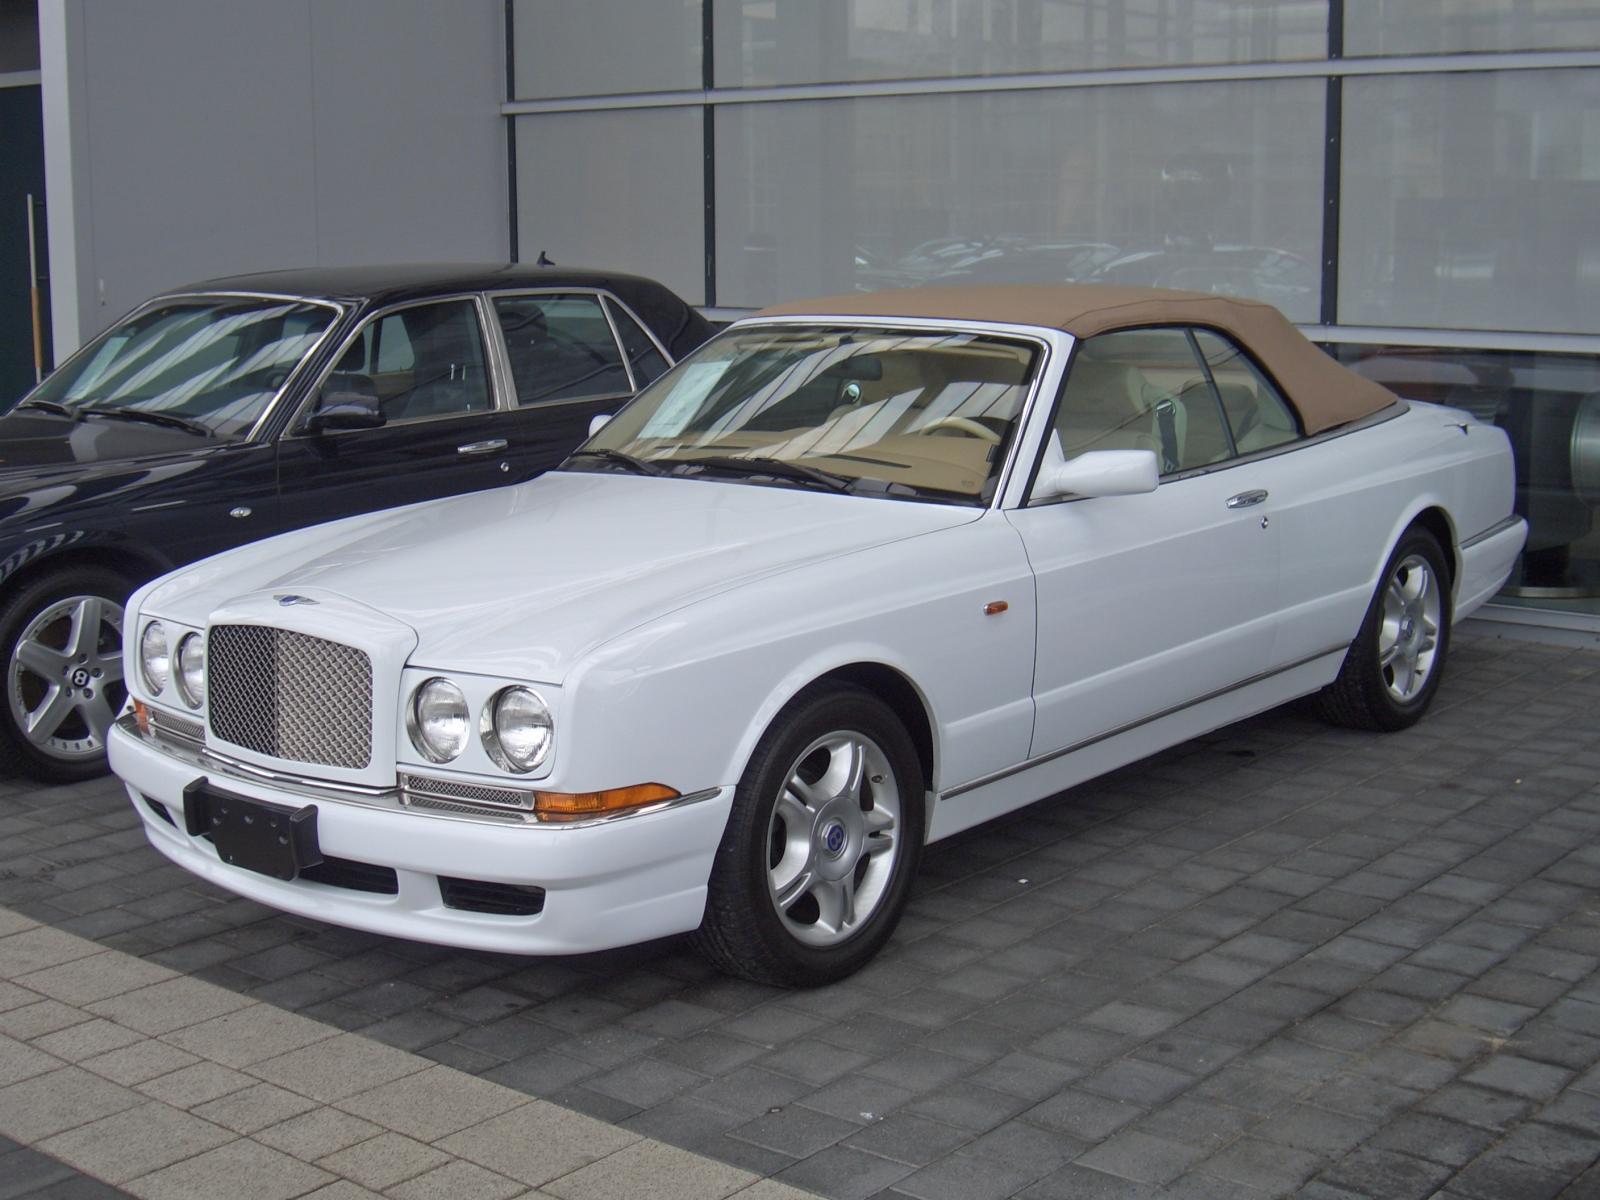 800 1024 1280 1600 origin 2003 bentley continental